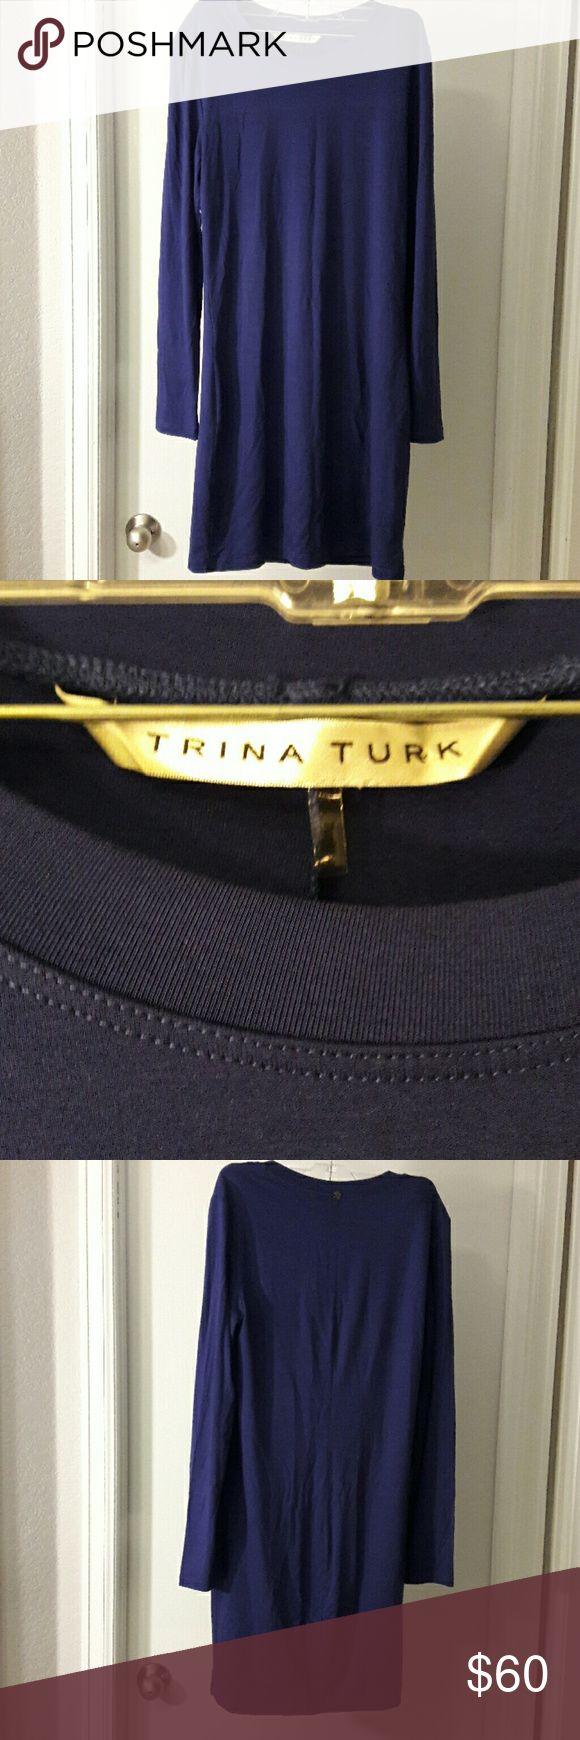 Colbalt Blue Trina Turk Blue Long Sleeve Dress NWOT Colbalt Blue Trina Turk Long Sleeve Dress Size Small 34 inches long Super soft! Trina Turk Dresses Long Sleeve